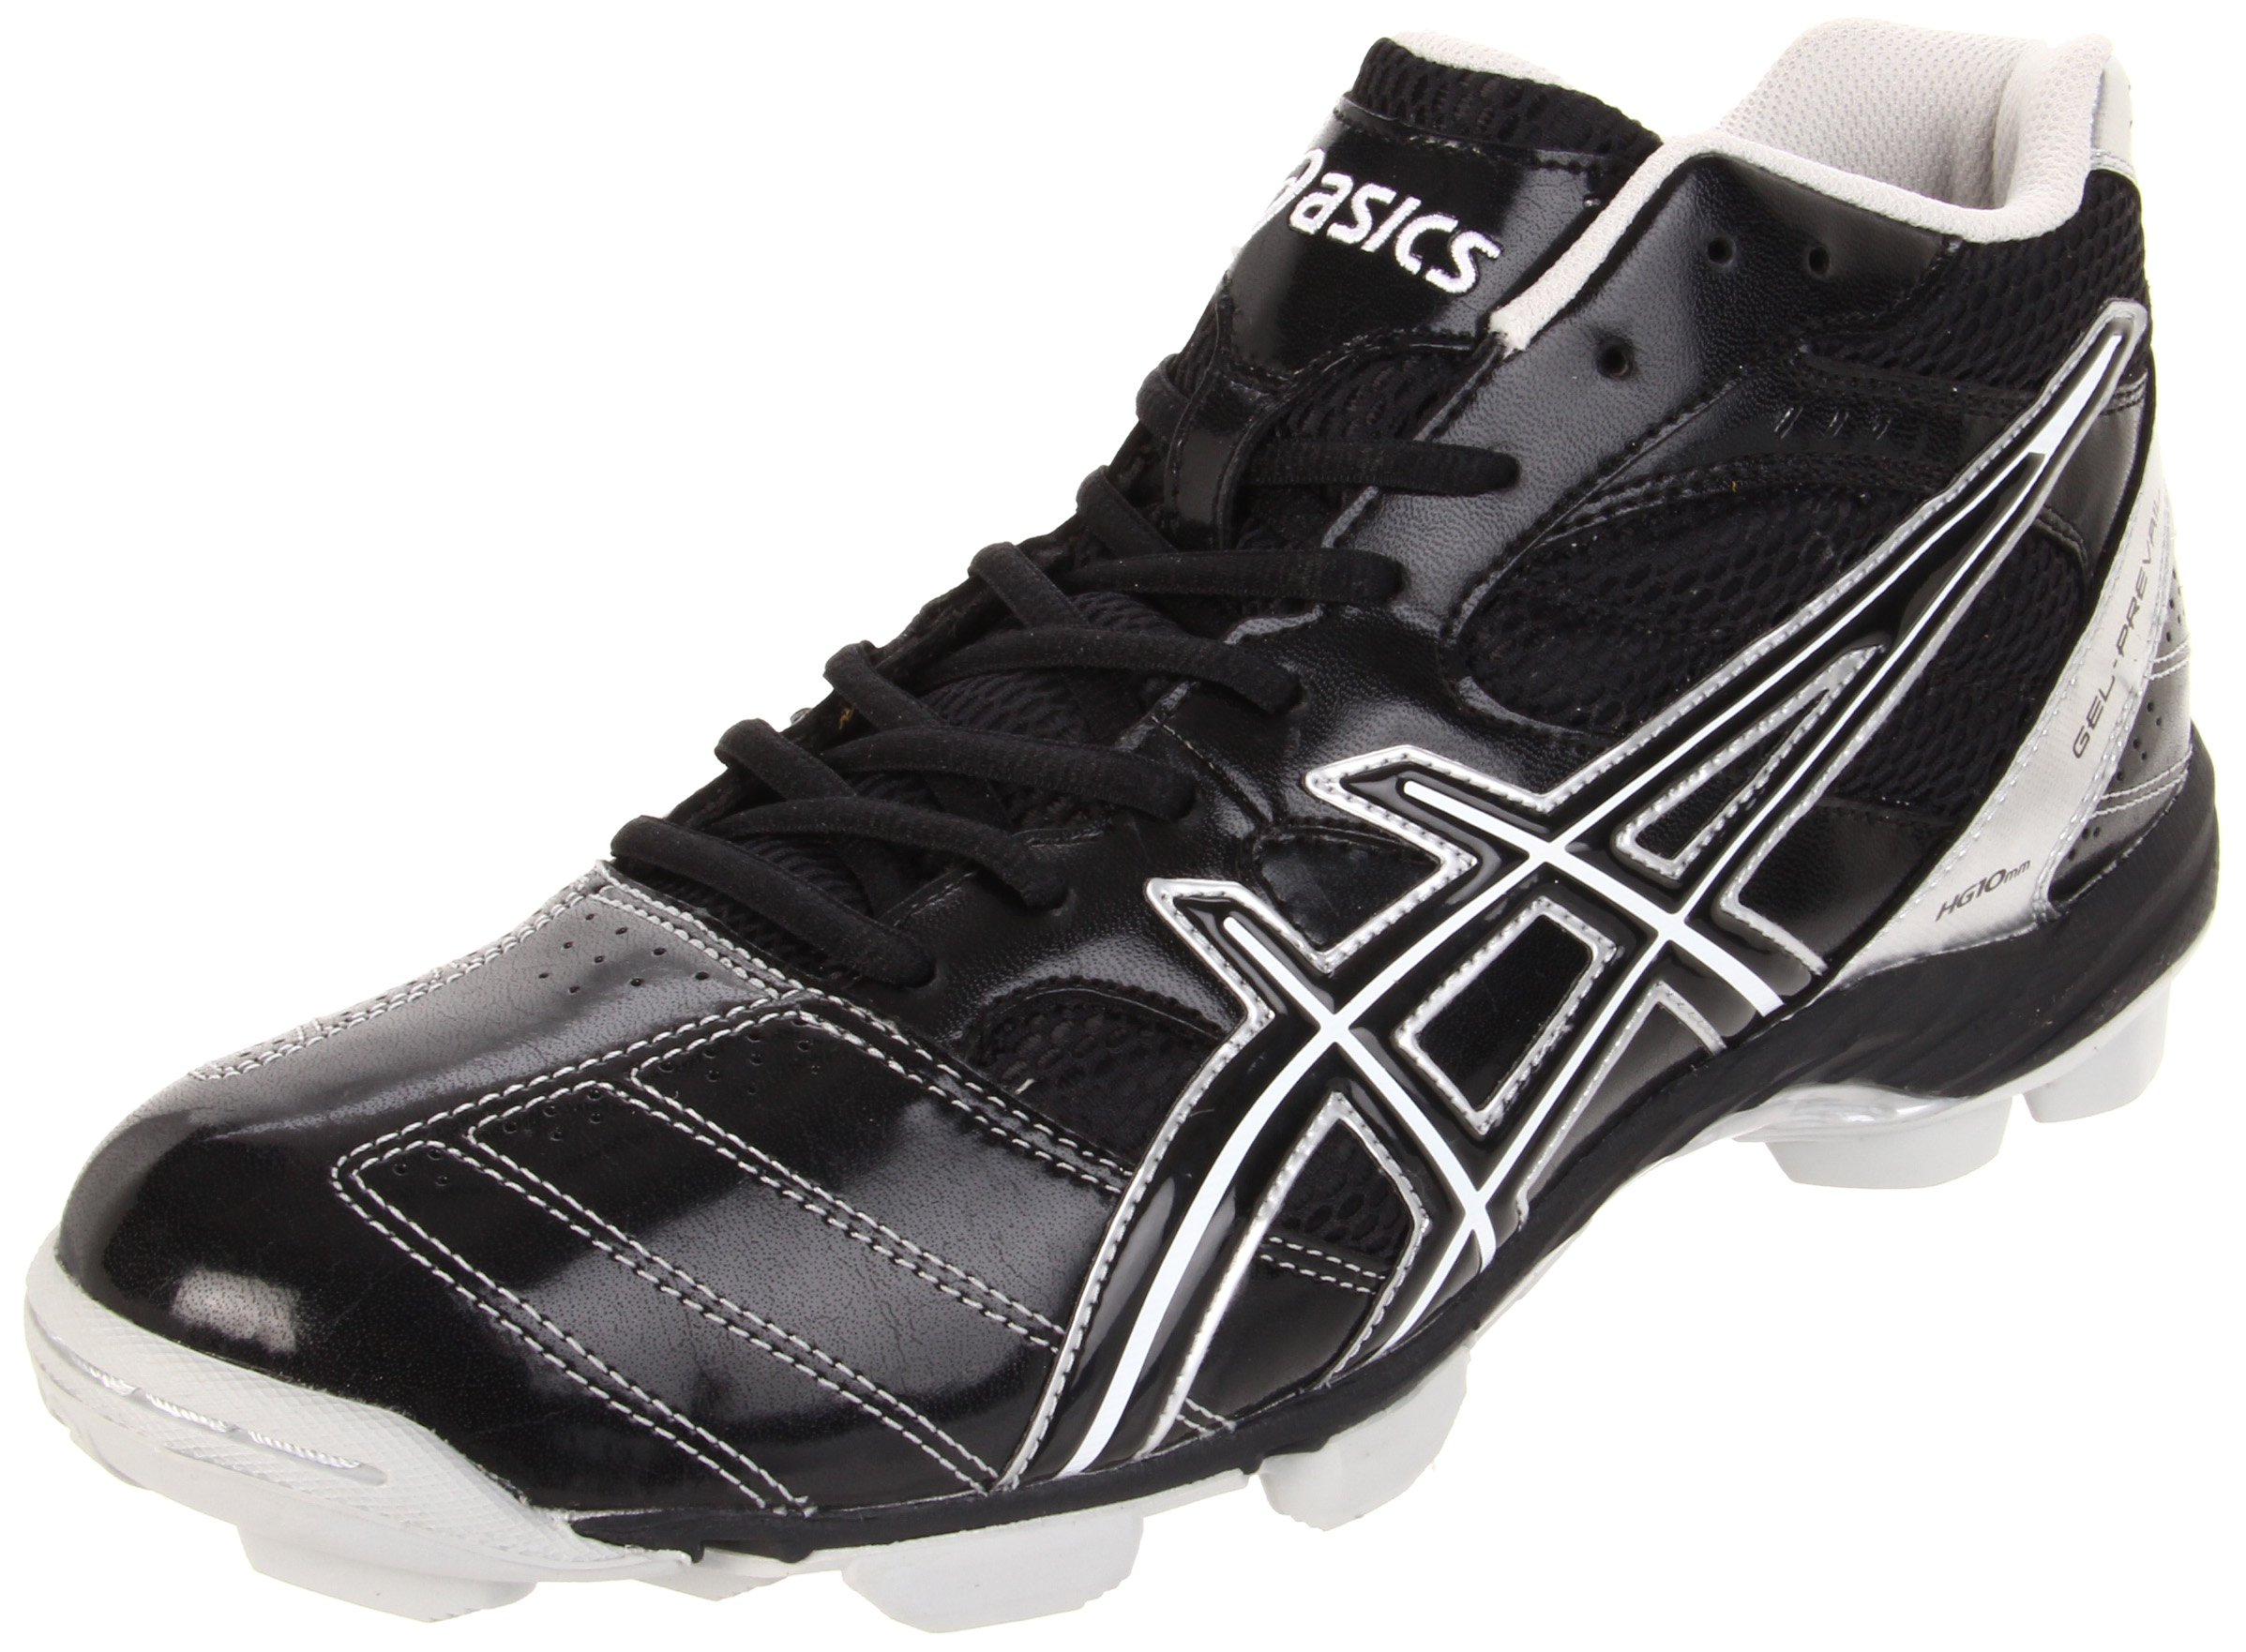 ASICS Men's GEL-Prevail Mid Lacrosse Shoe,Black/Silver,10 M US by ASICS